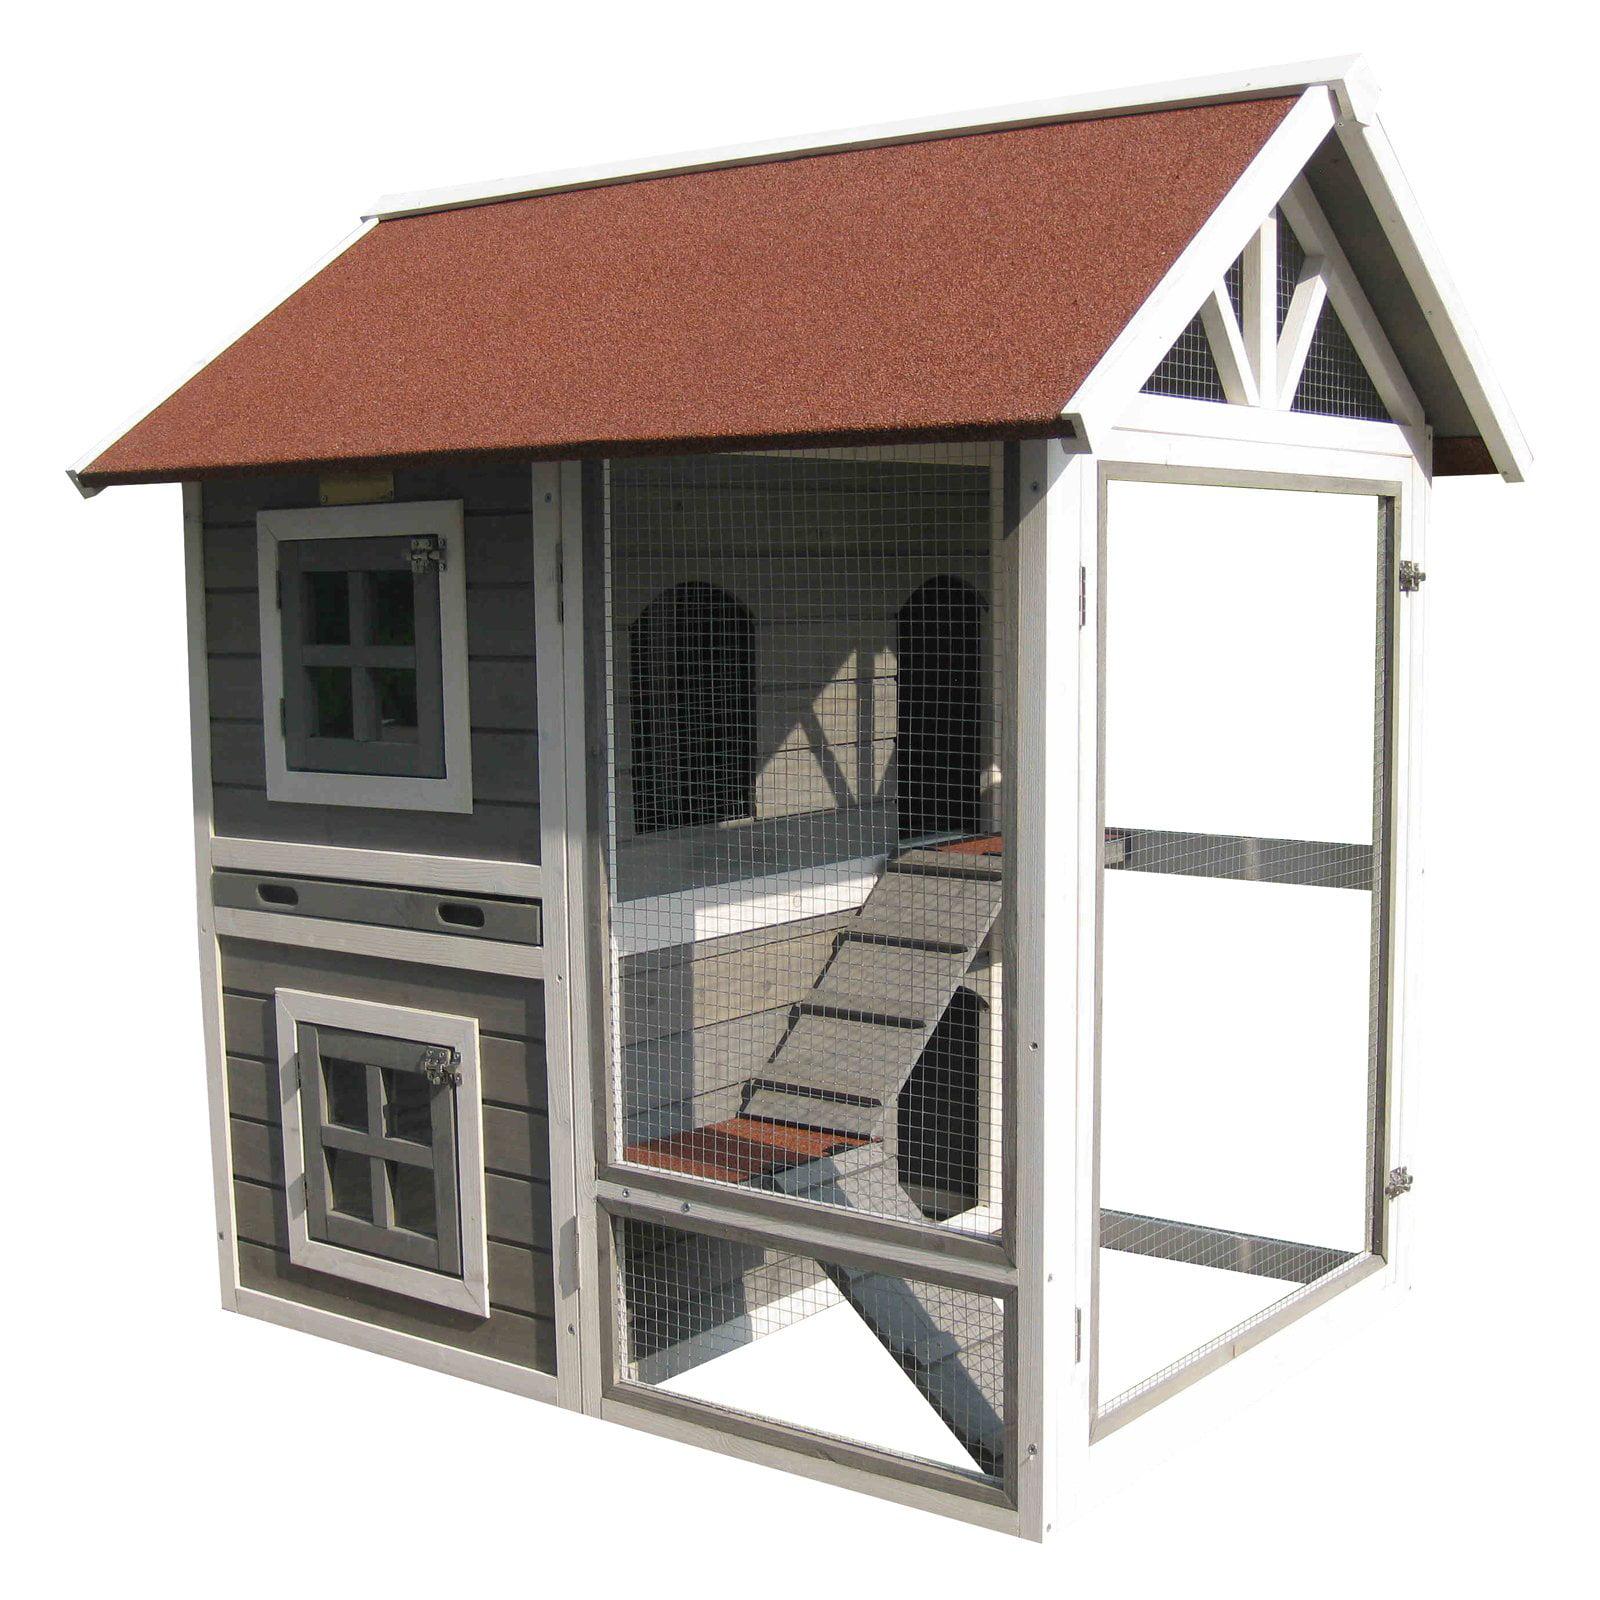 Advantek Row House Rabbit Hutch by